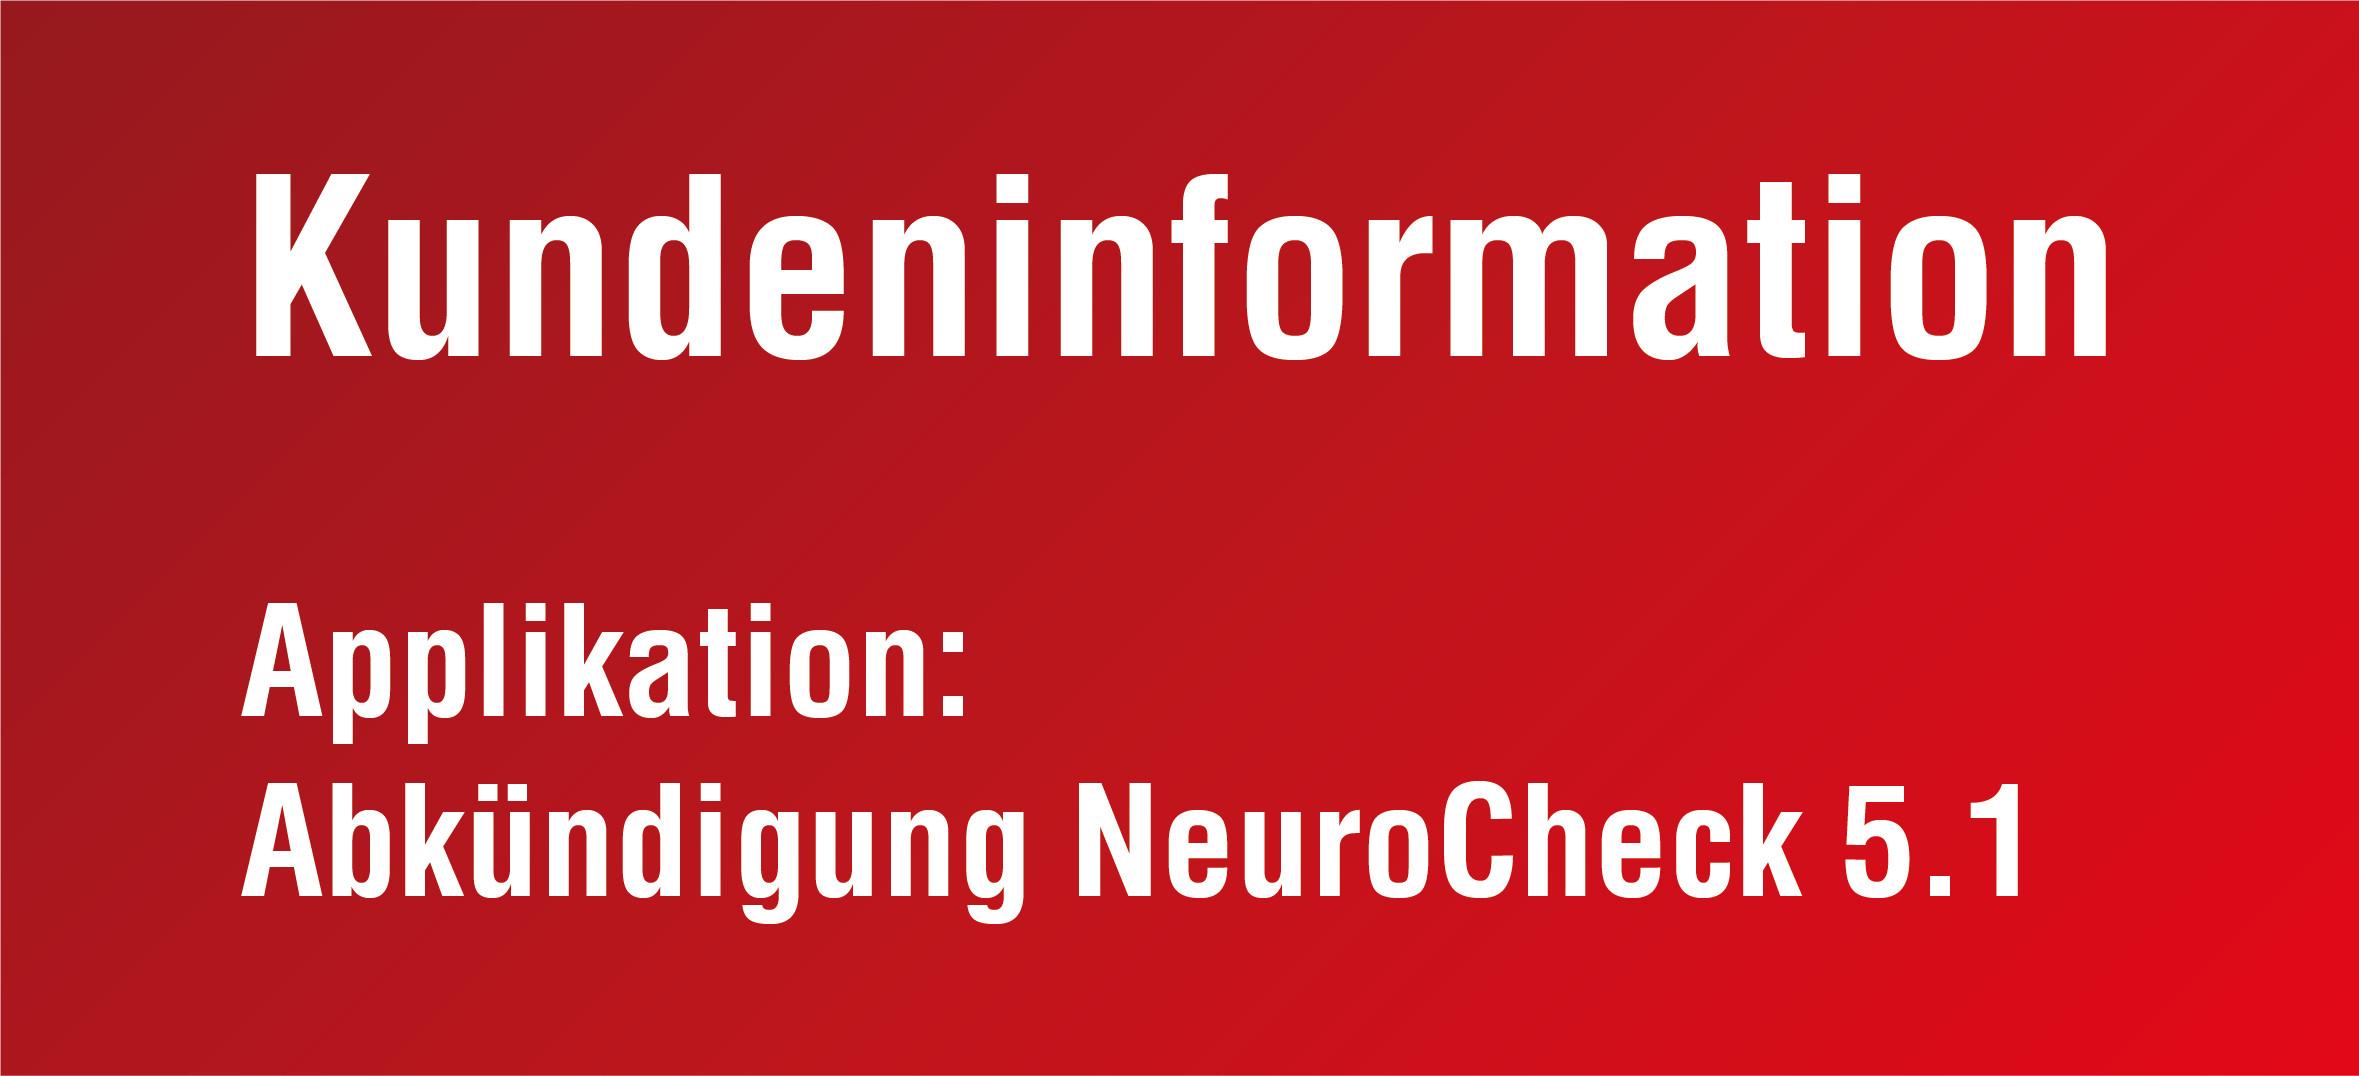 NeuroCheck Kundeninformation - Abkündigung NeuroCheck 5.1 (Foto © NeuroCheck)